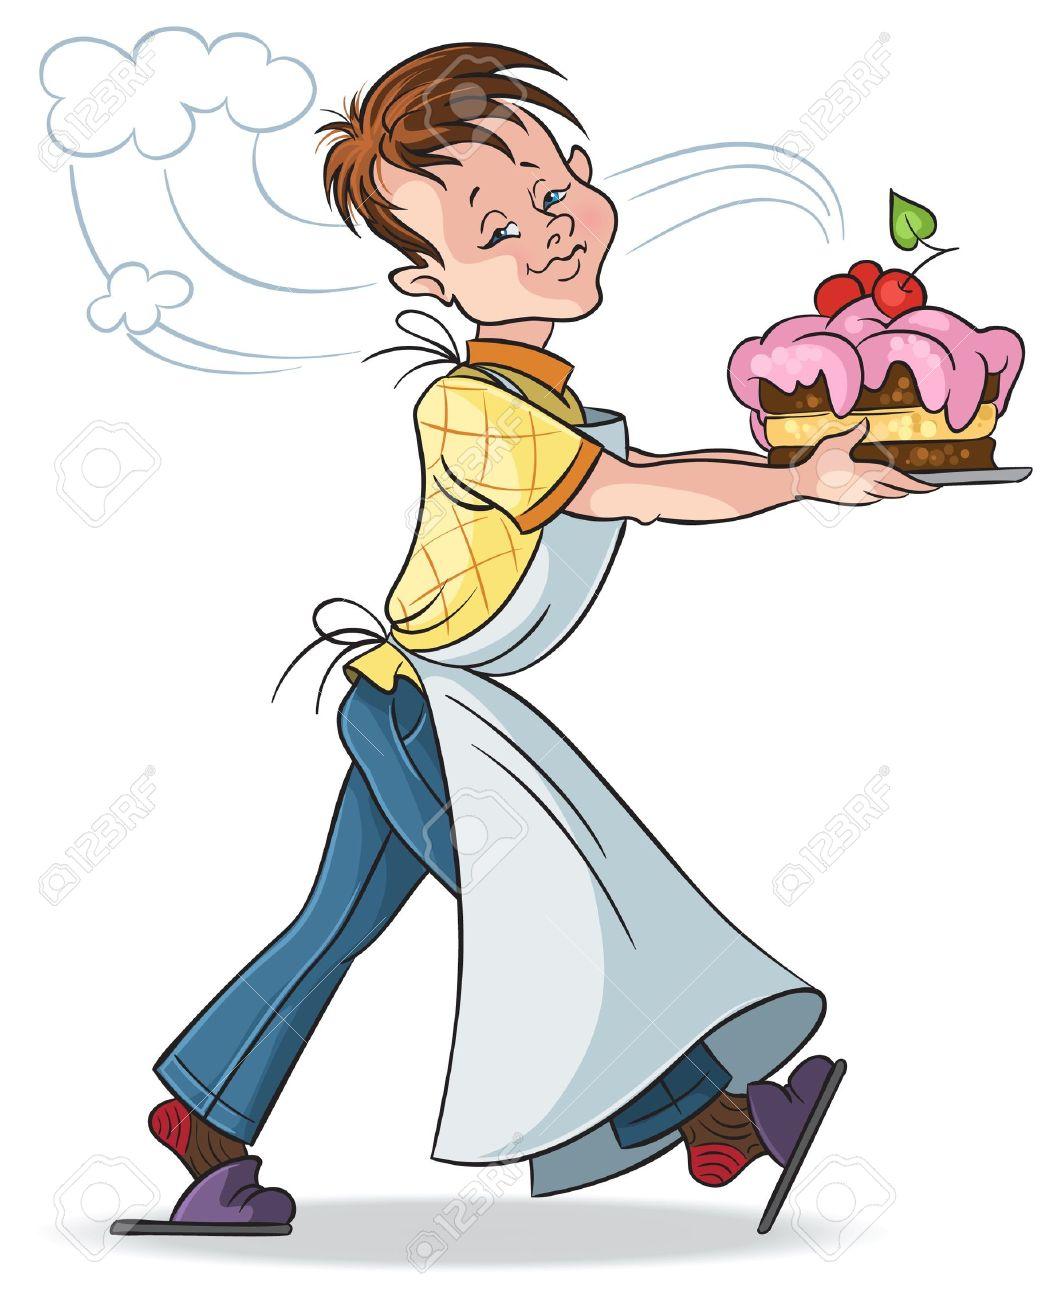 Happy birthday mom Happy boy with a cake on a white background - 12793055